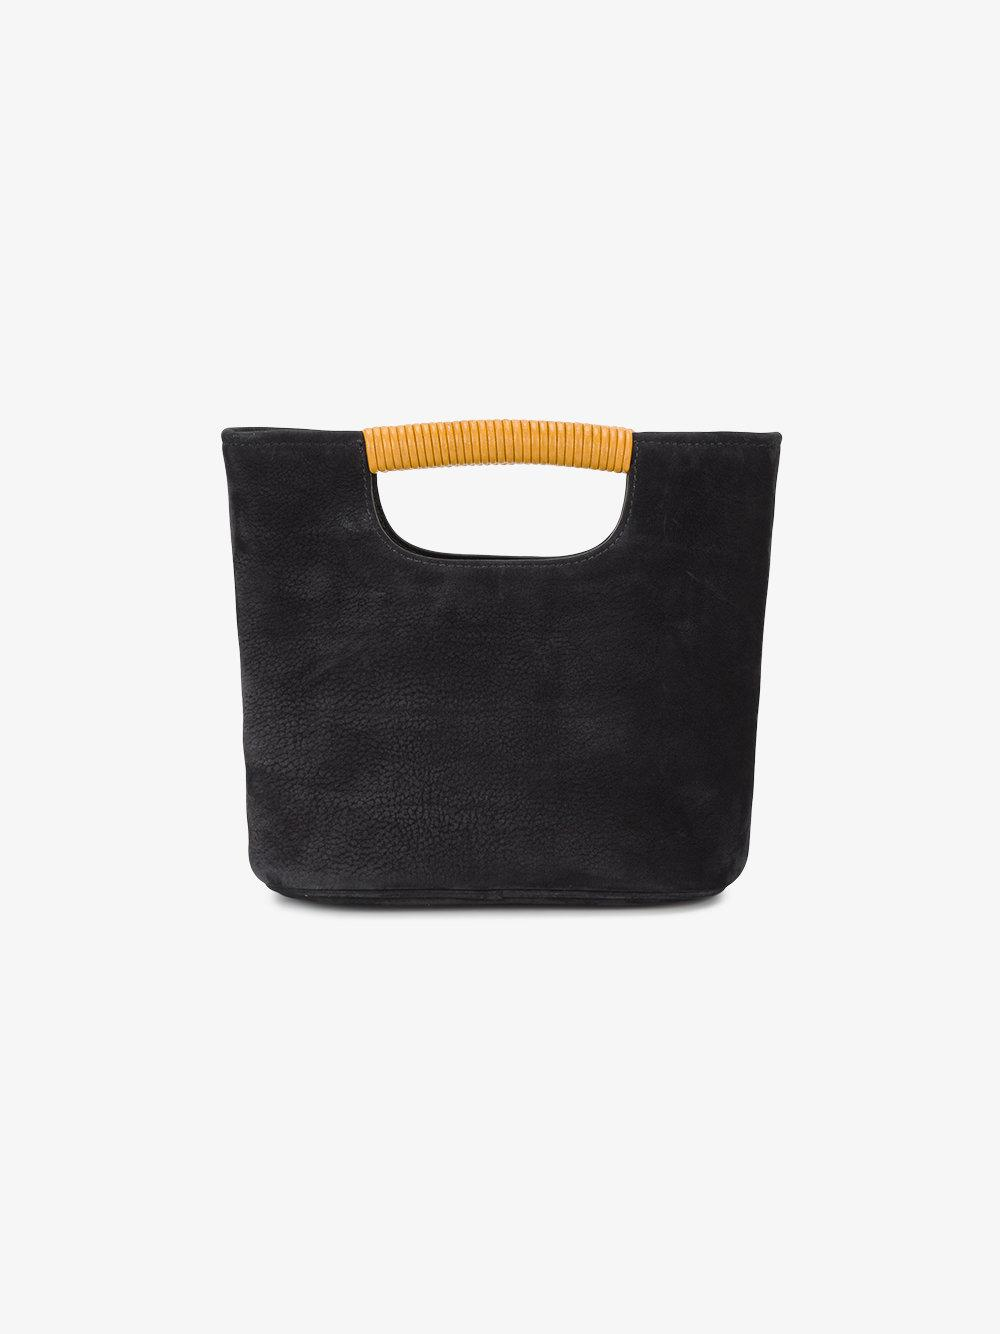 Simon Miller Suede Mini Black Birch Tote Bag in Brown